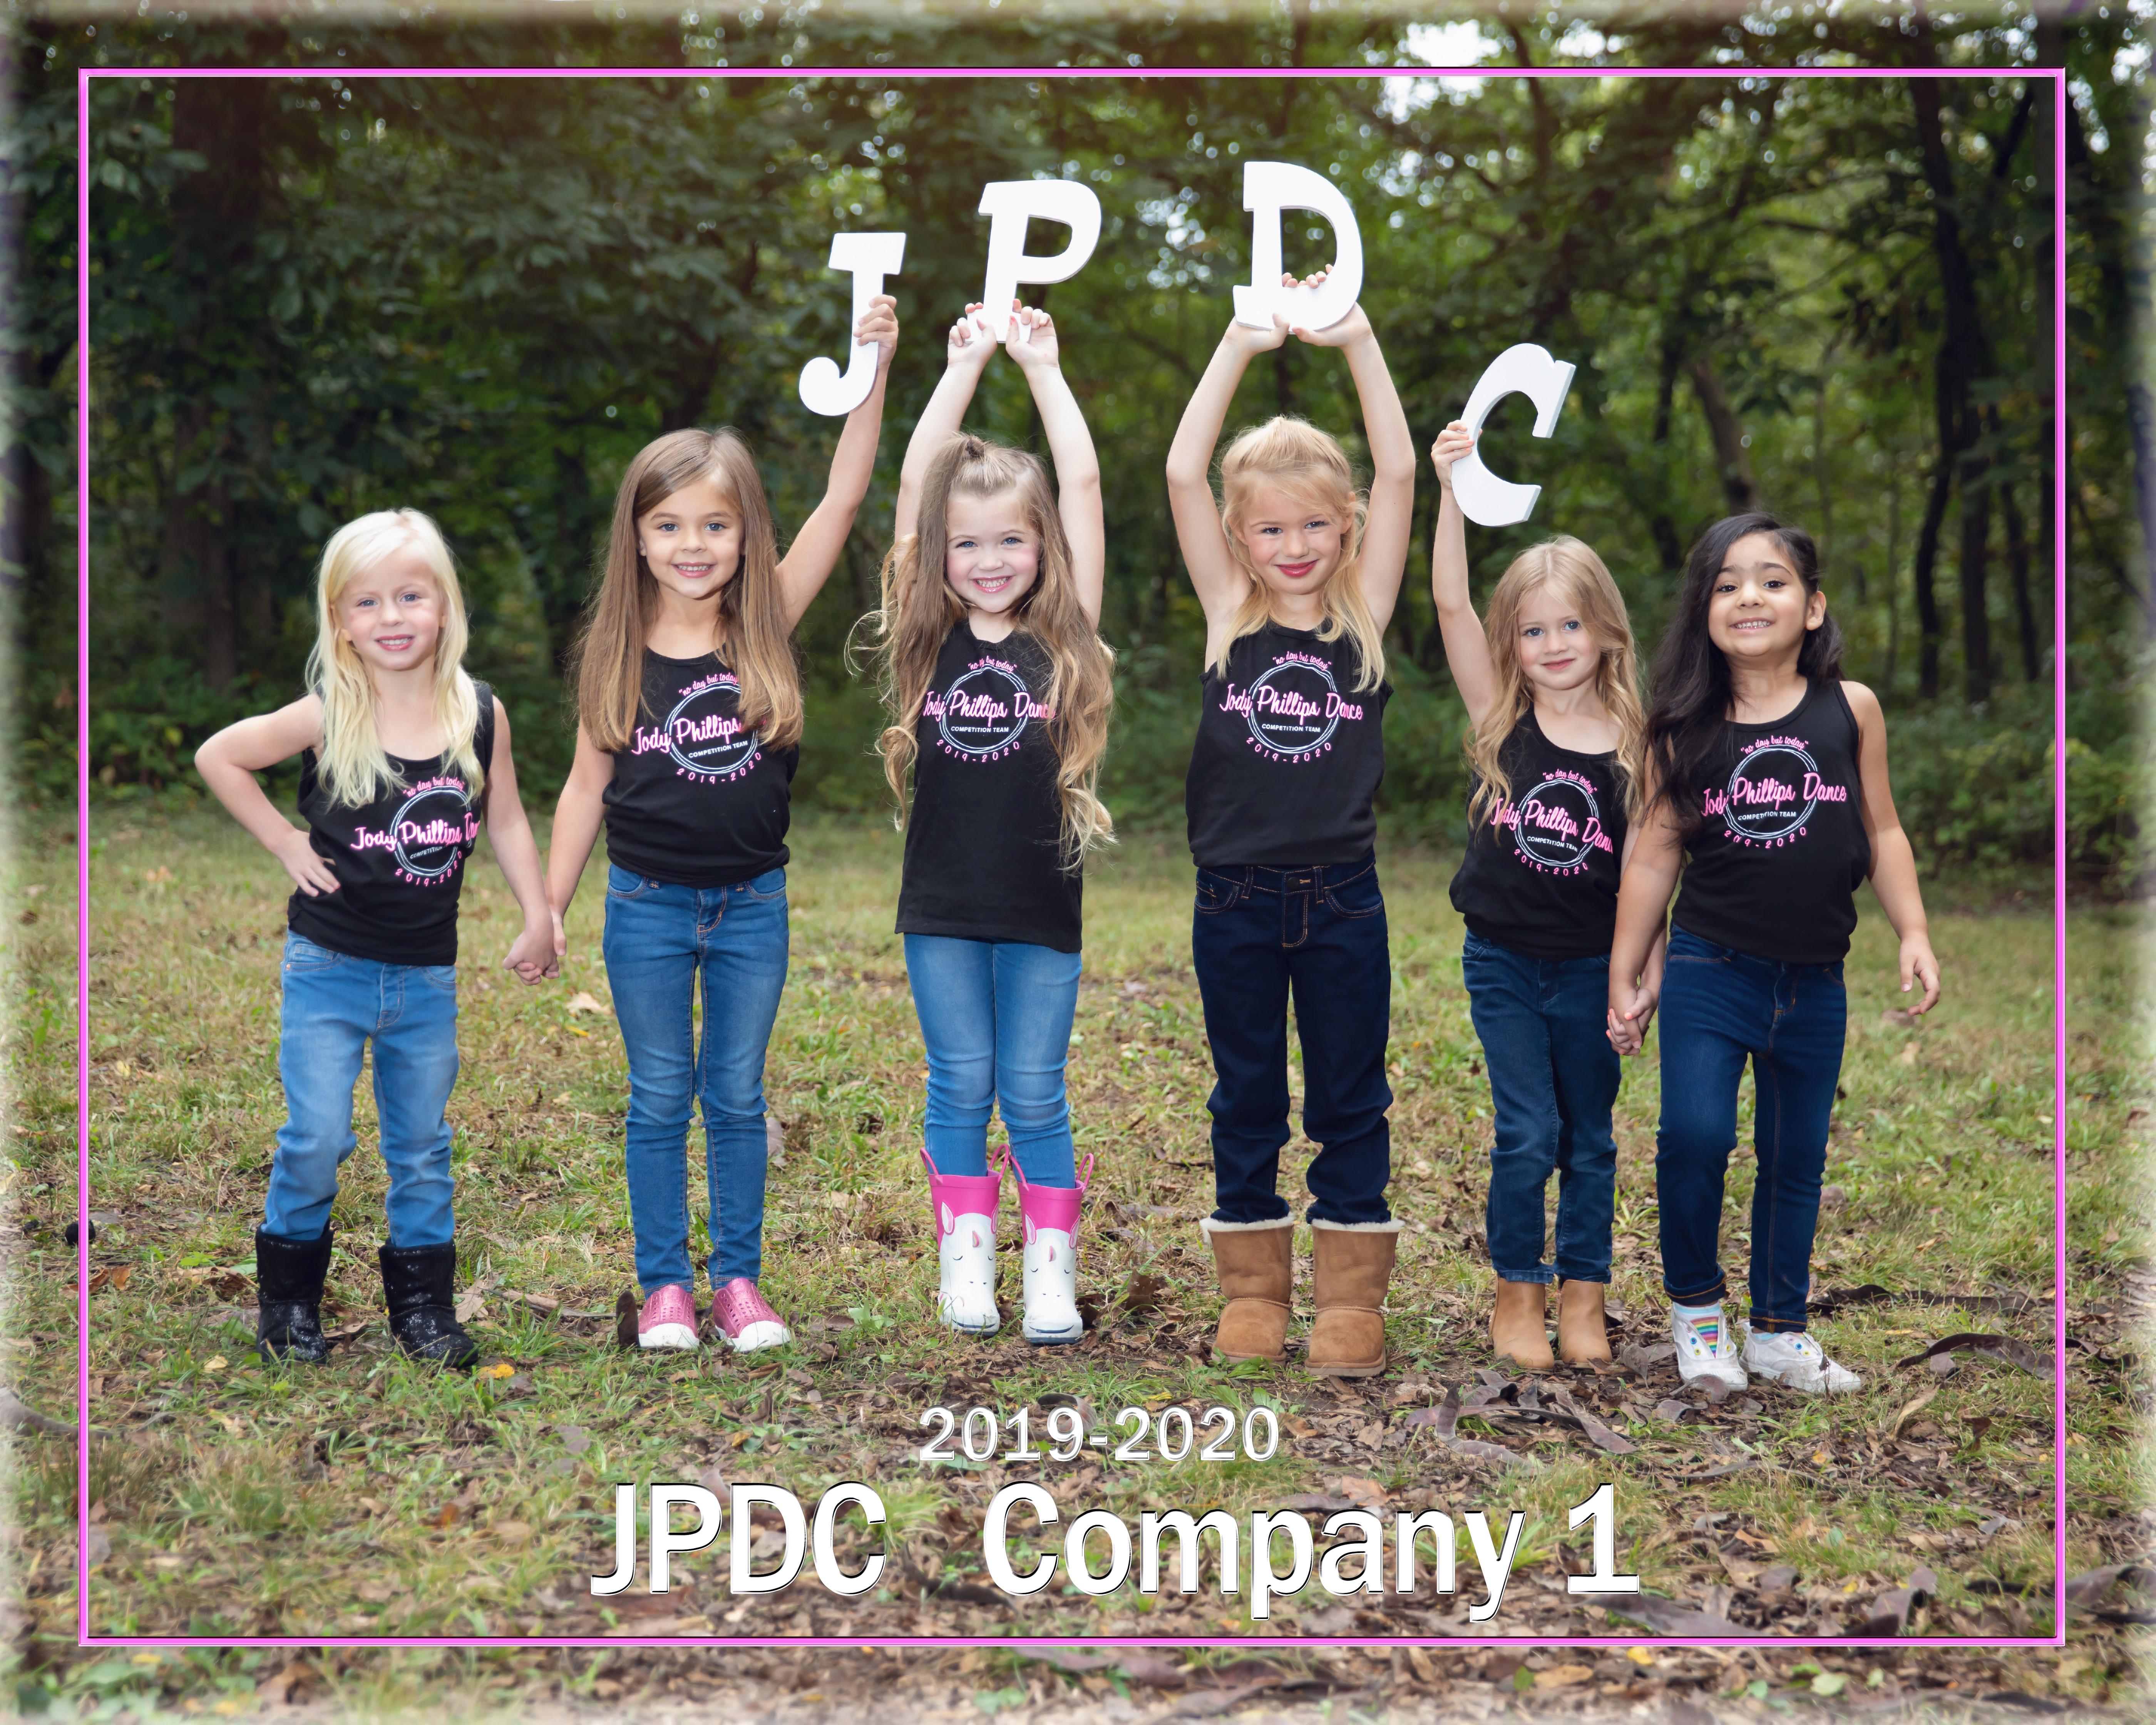 JPDC_Company_15eCropFinal